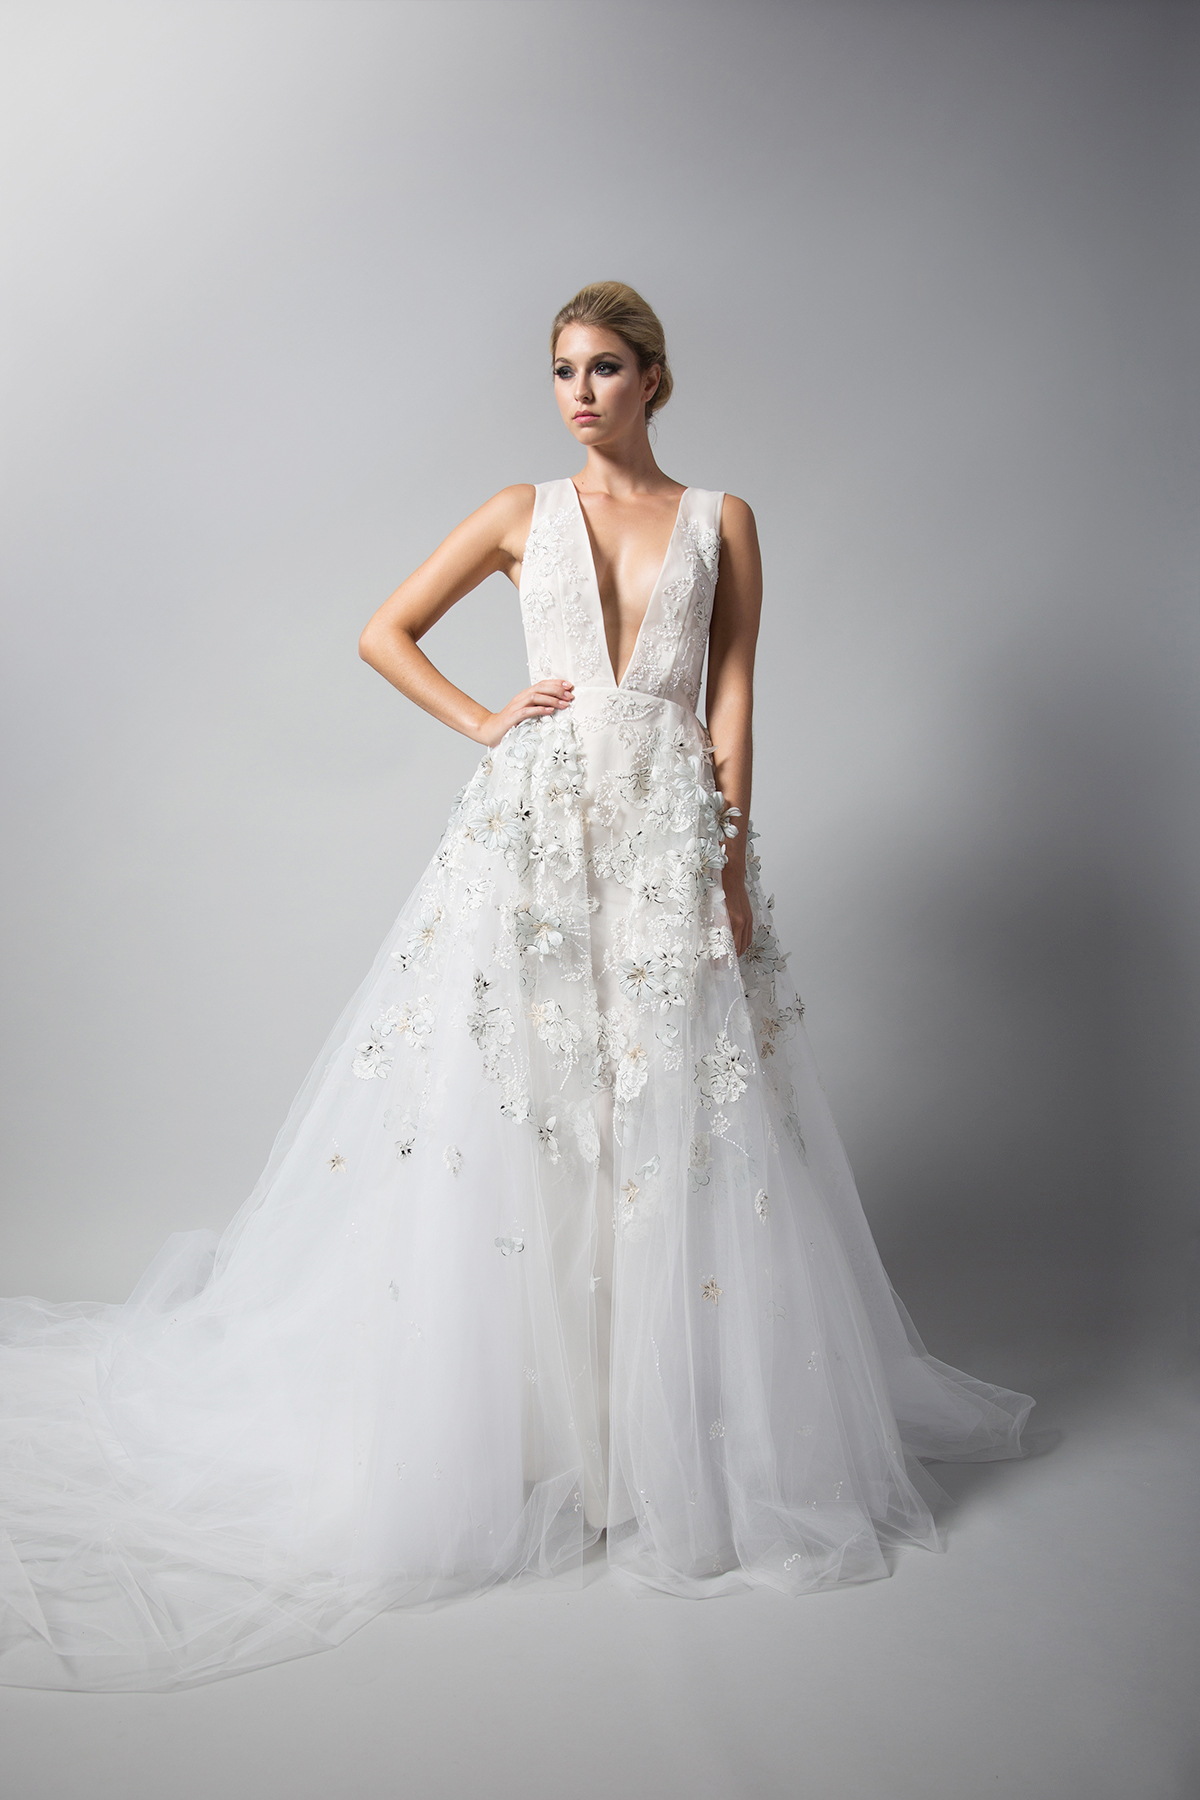 randi rahm tule wedding dress with straps and flower embellishments fall 2018